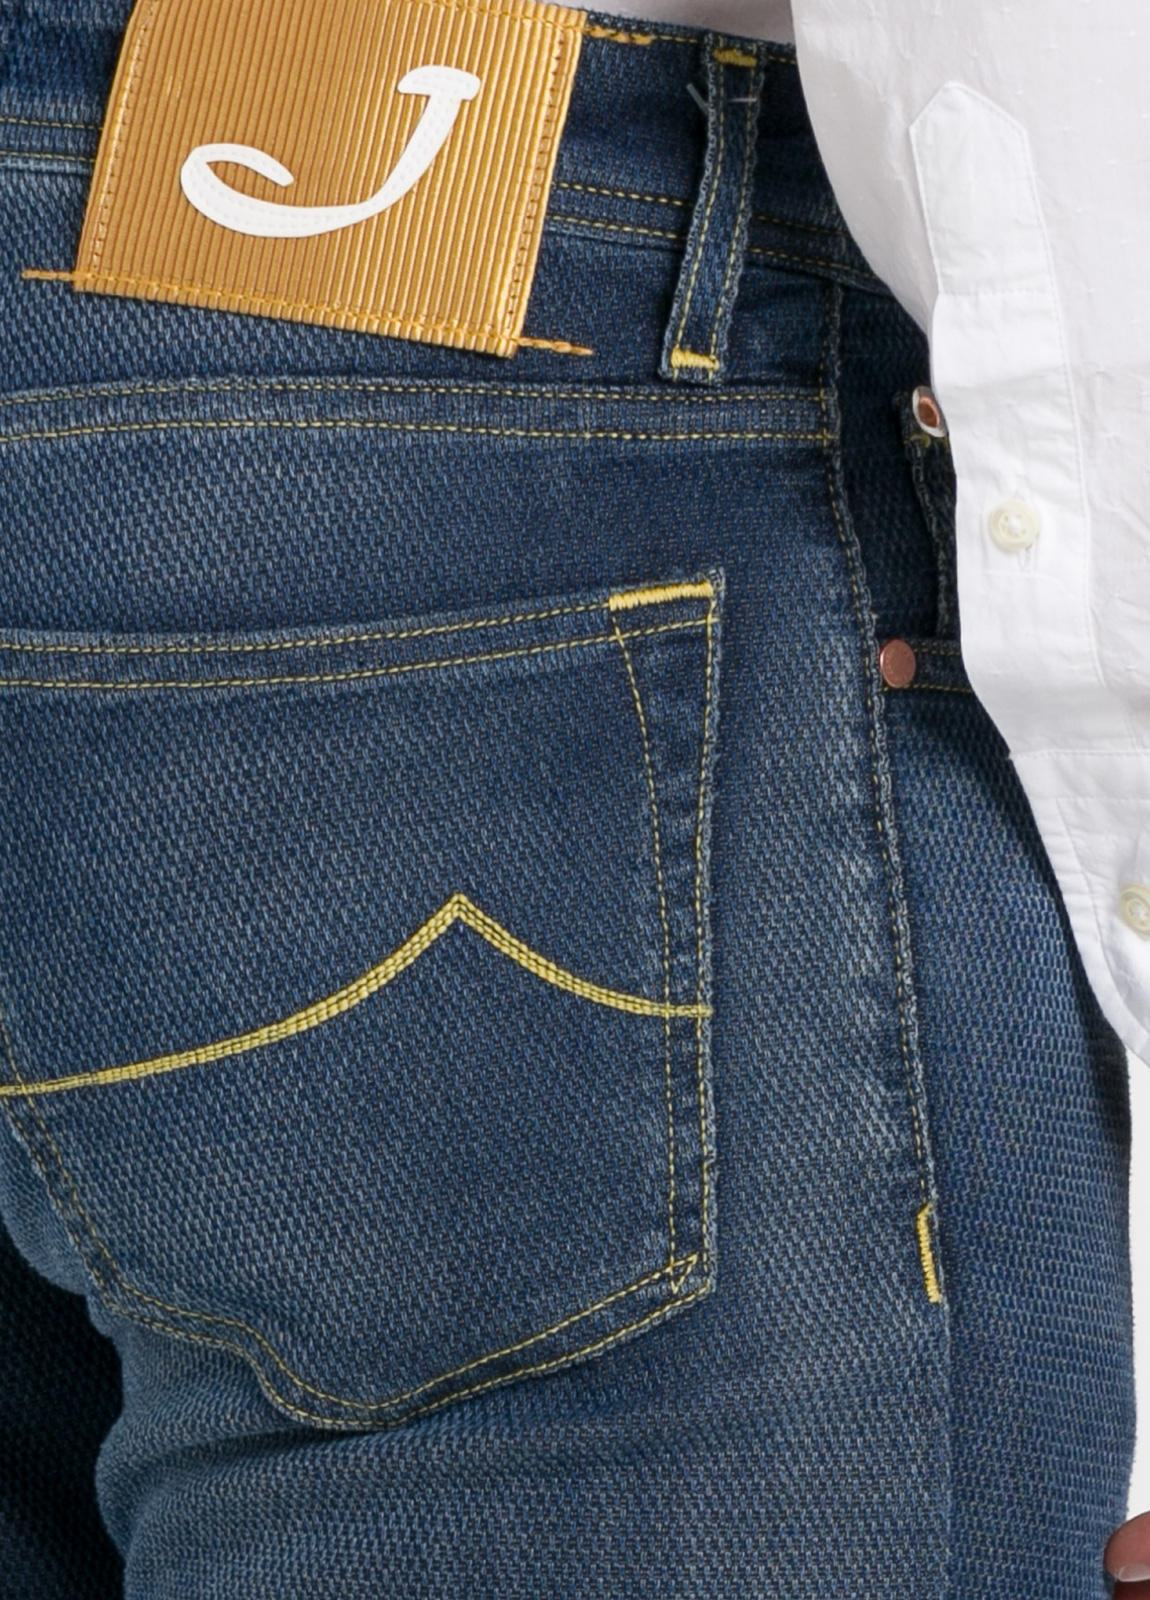 Tejano ligeramente slim fit modelo J622 color azul oscuro denim. 56% algodón,44% Poliéster. - Ítem2